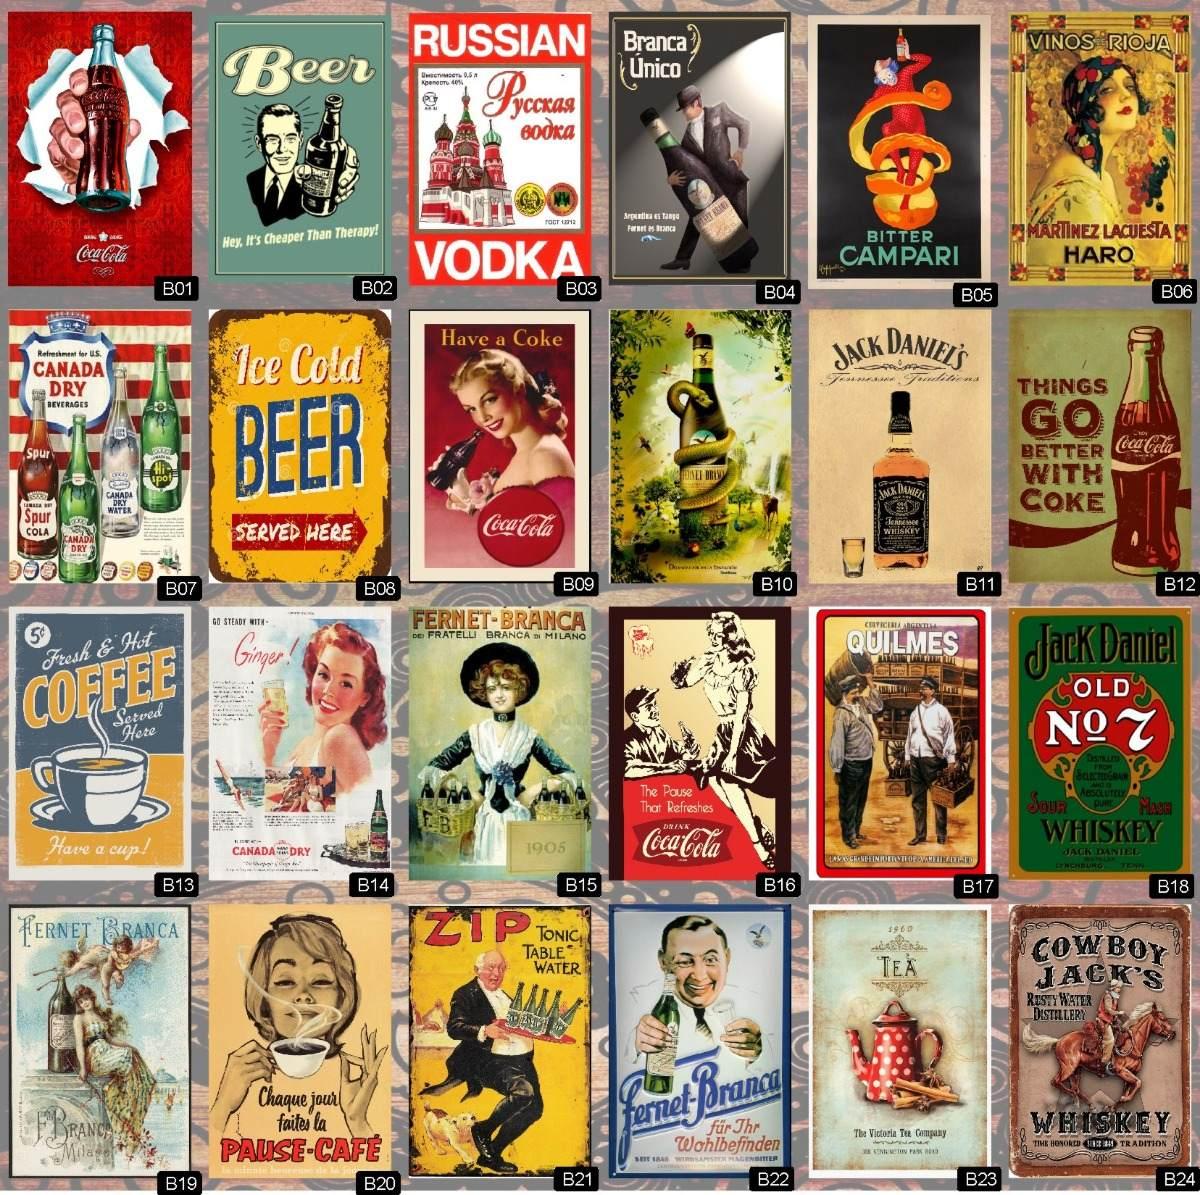 Cuadros Vintage Retro Impresos,40x50 Ofertaa - $ 180,00 en Mercado Libre